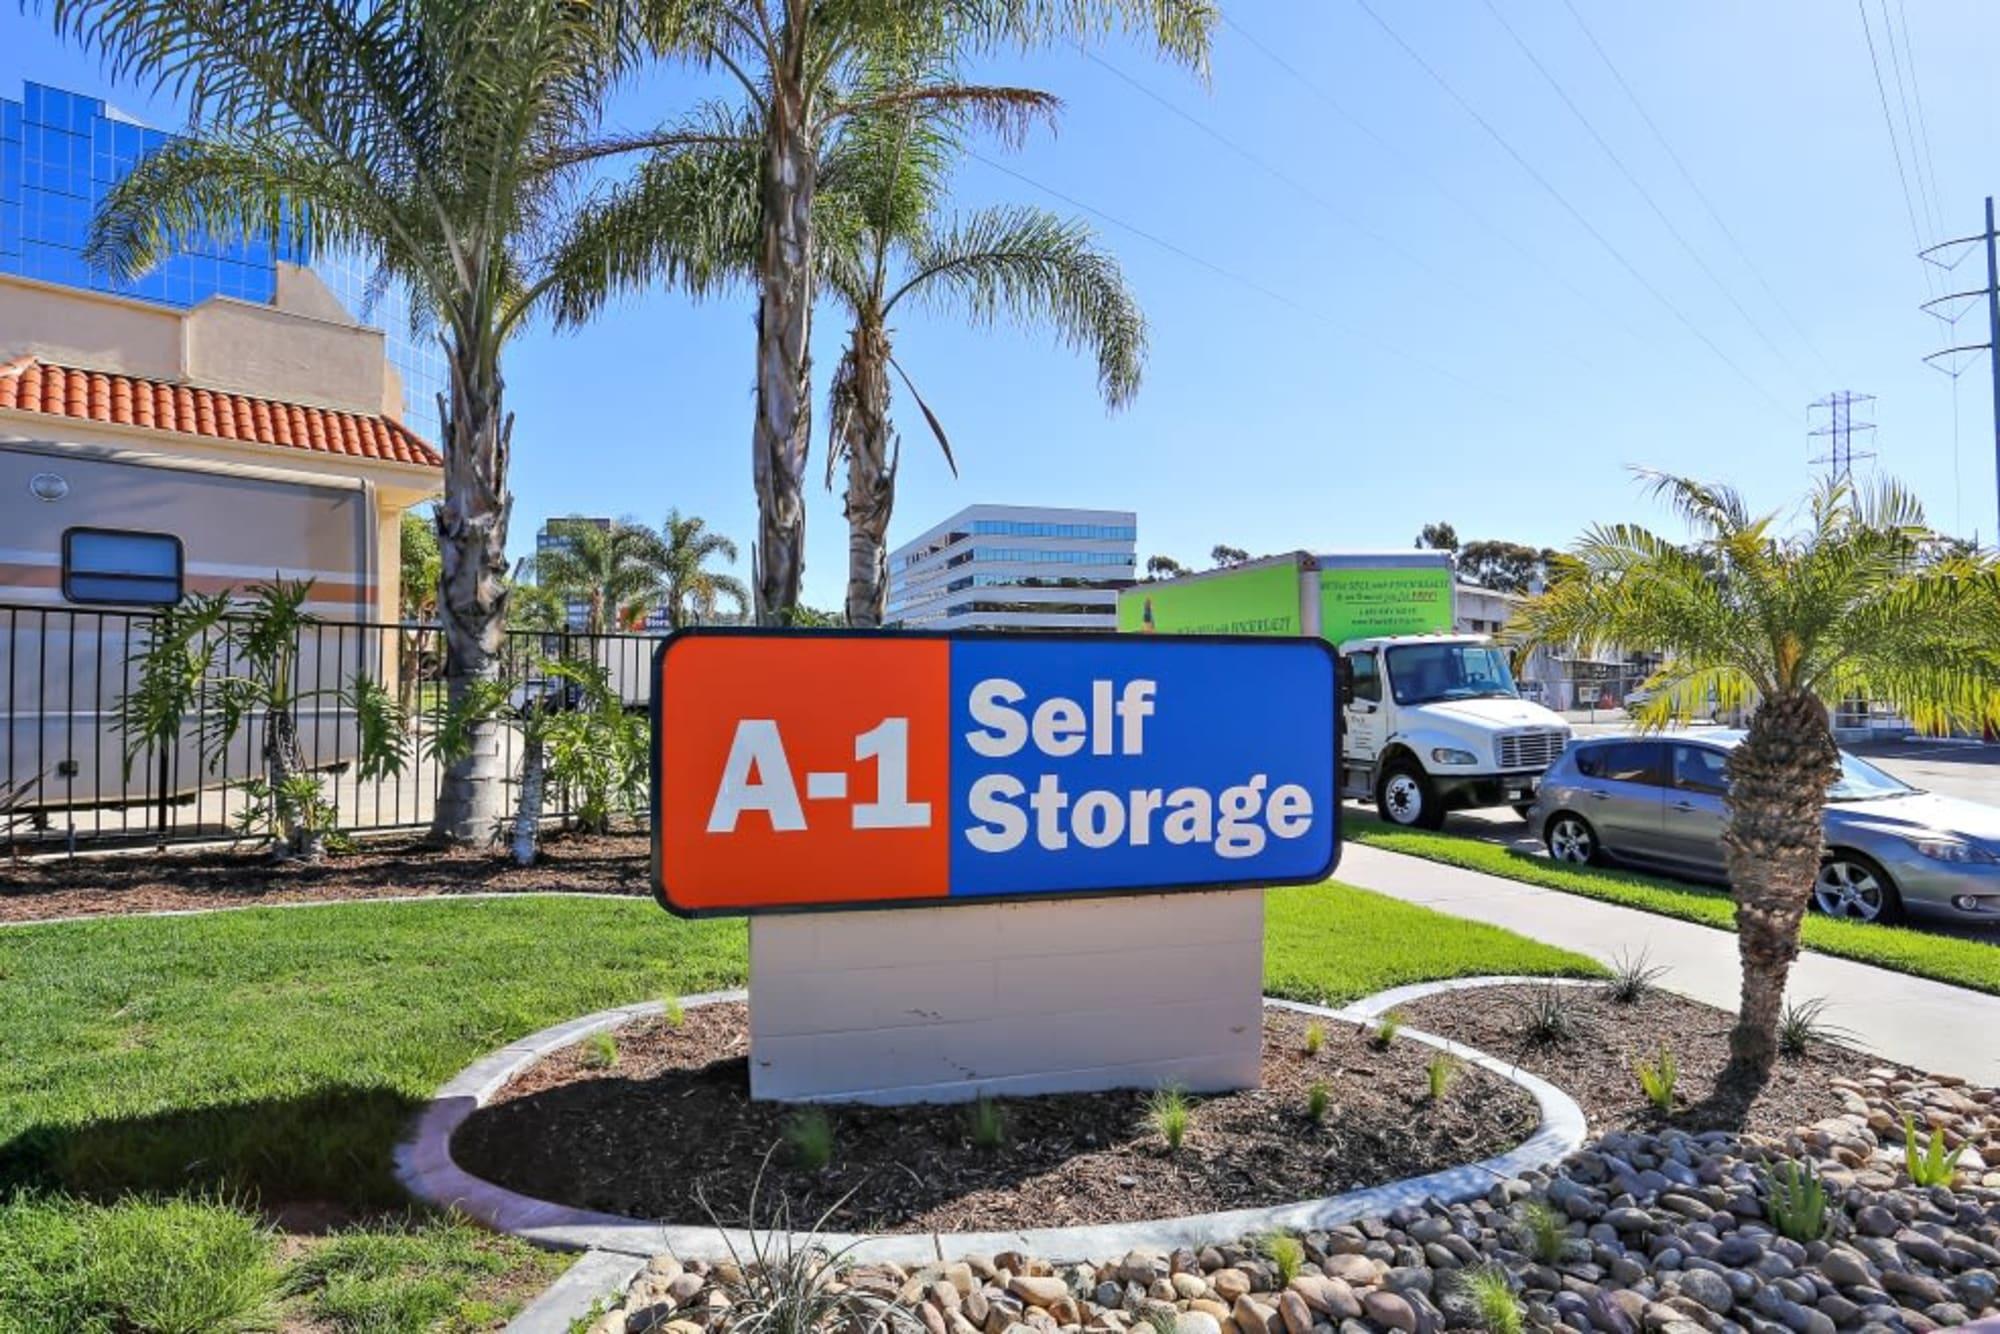 Convenient Location in A-1 Self Storage San Diego.